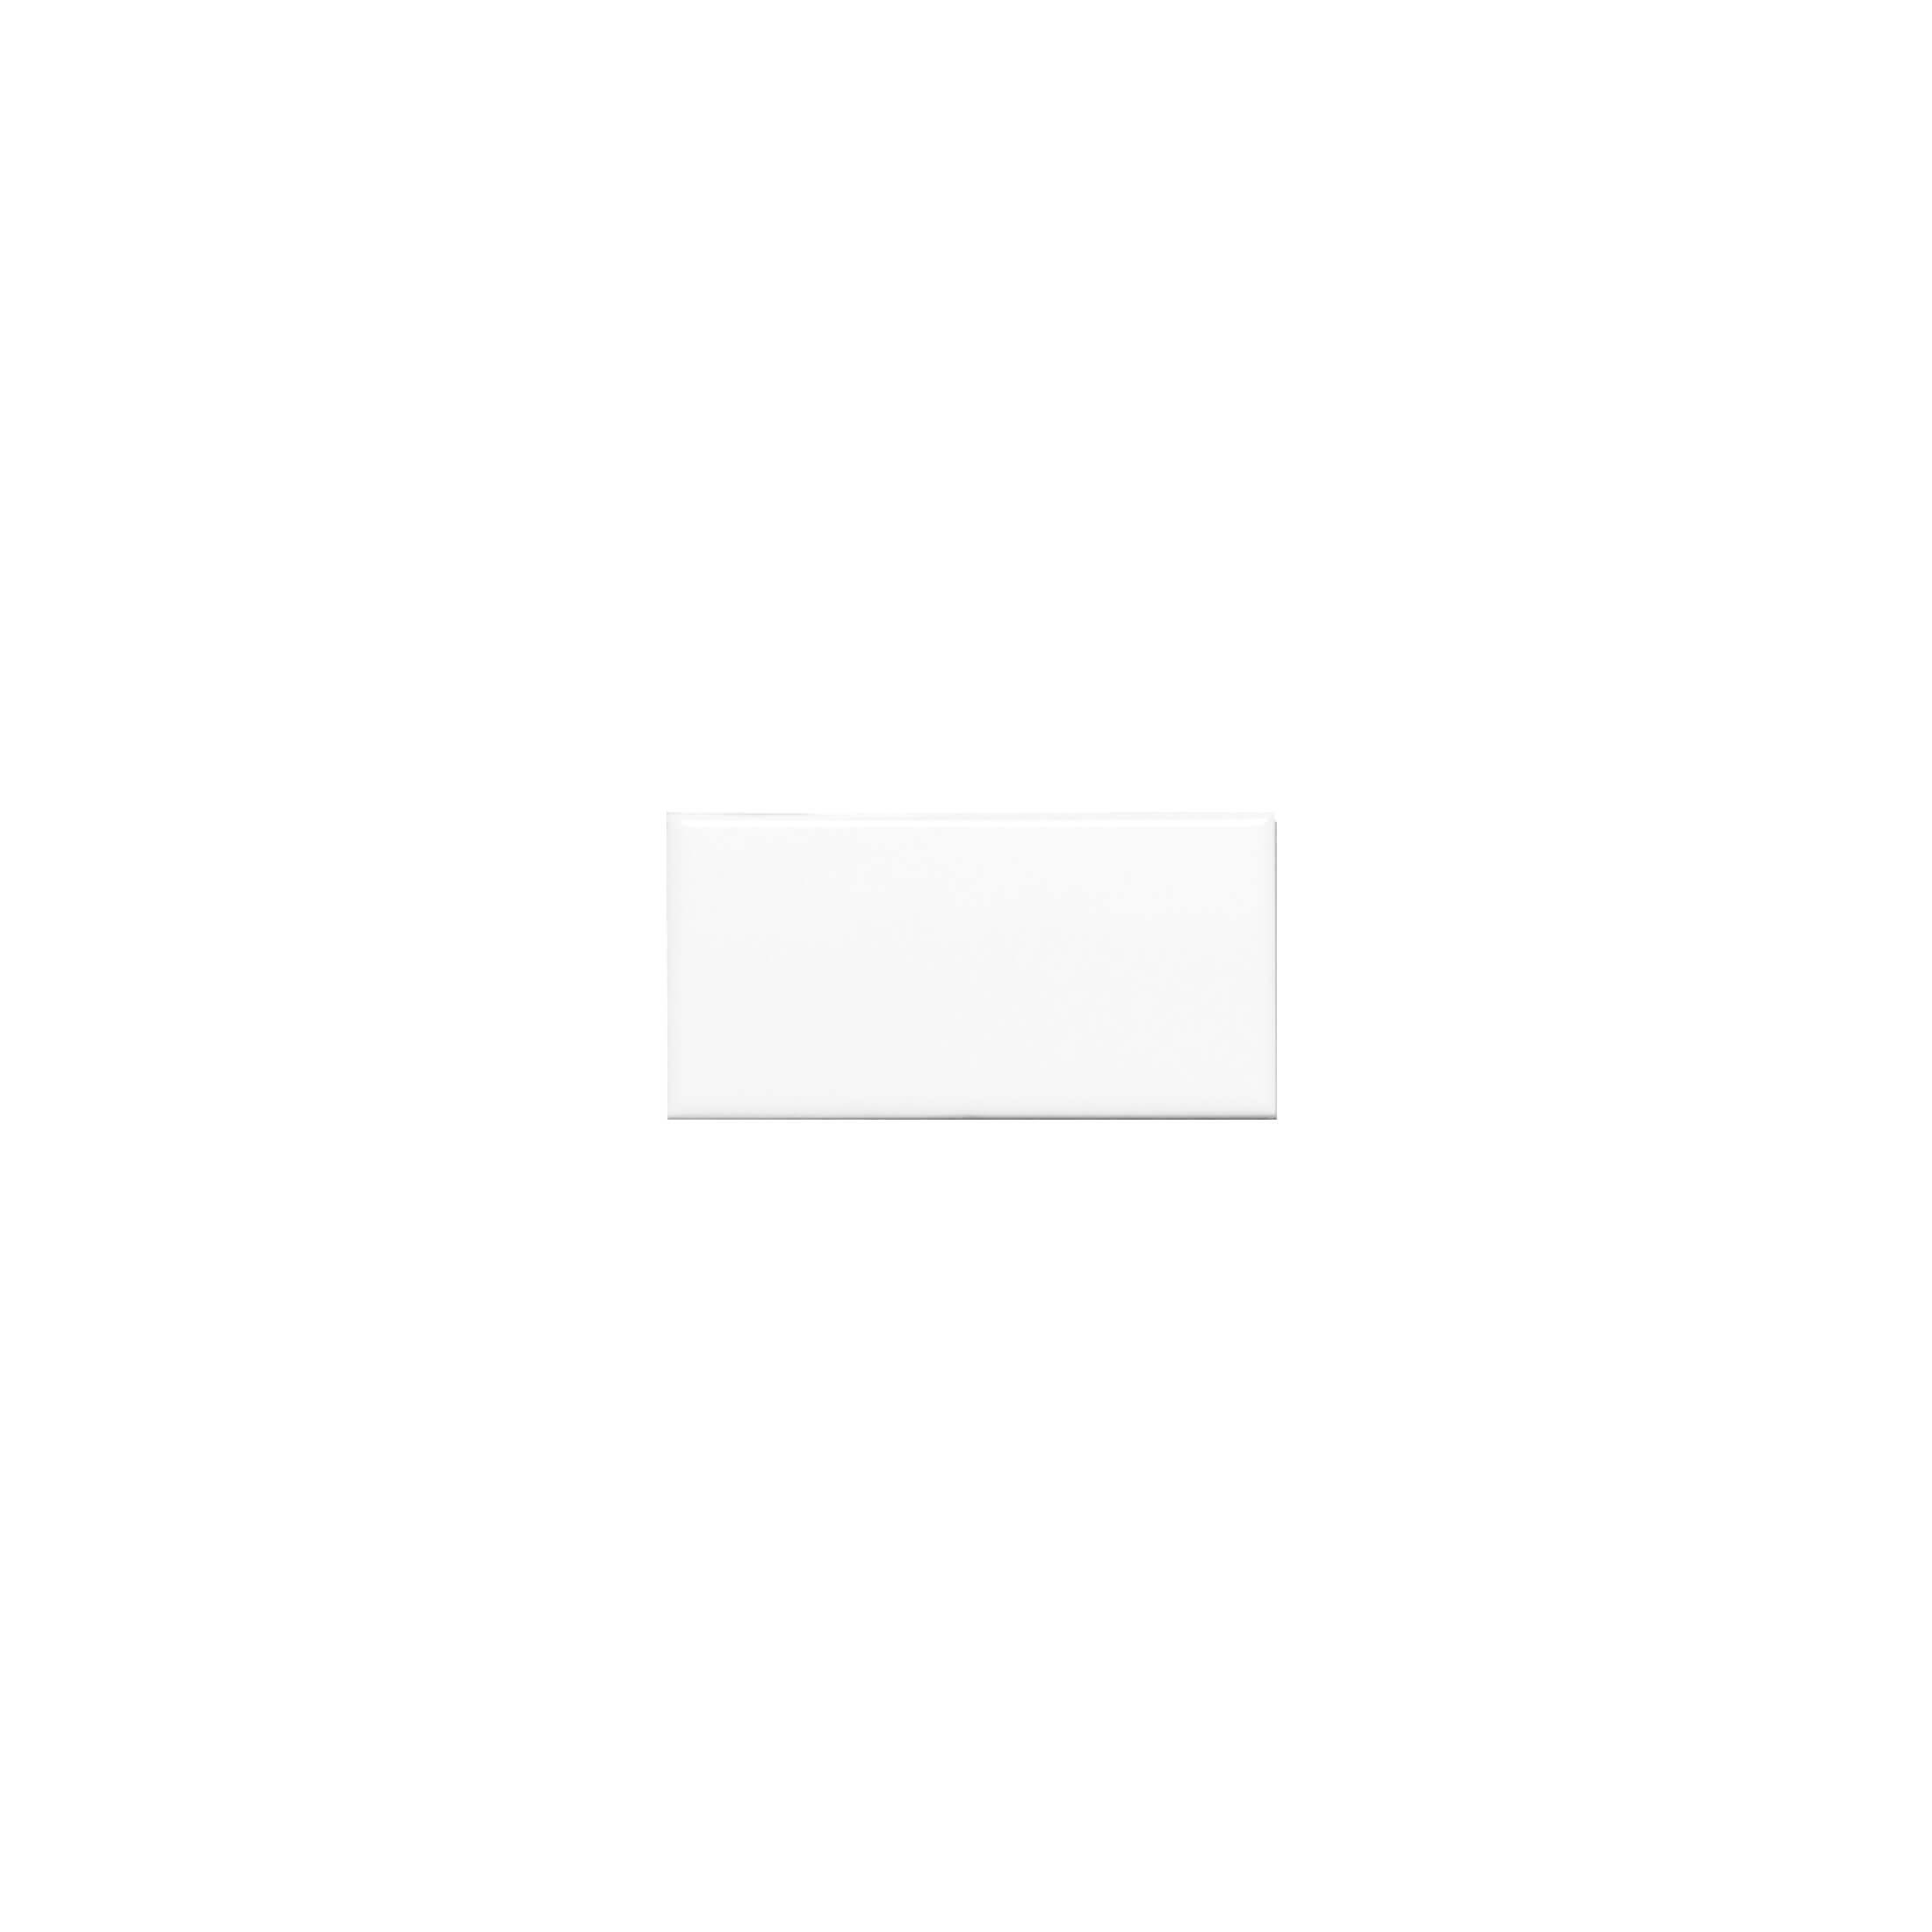 ADNE1046 - LISO PB - 5 cm X 10 cm